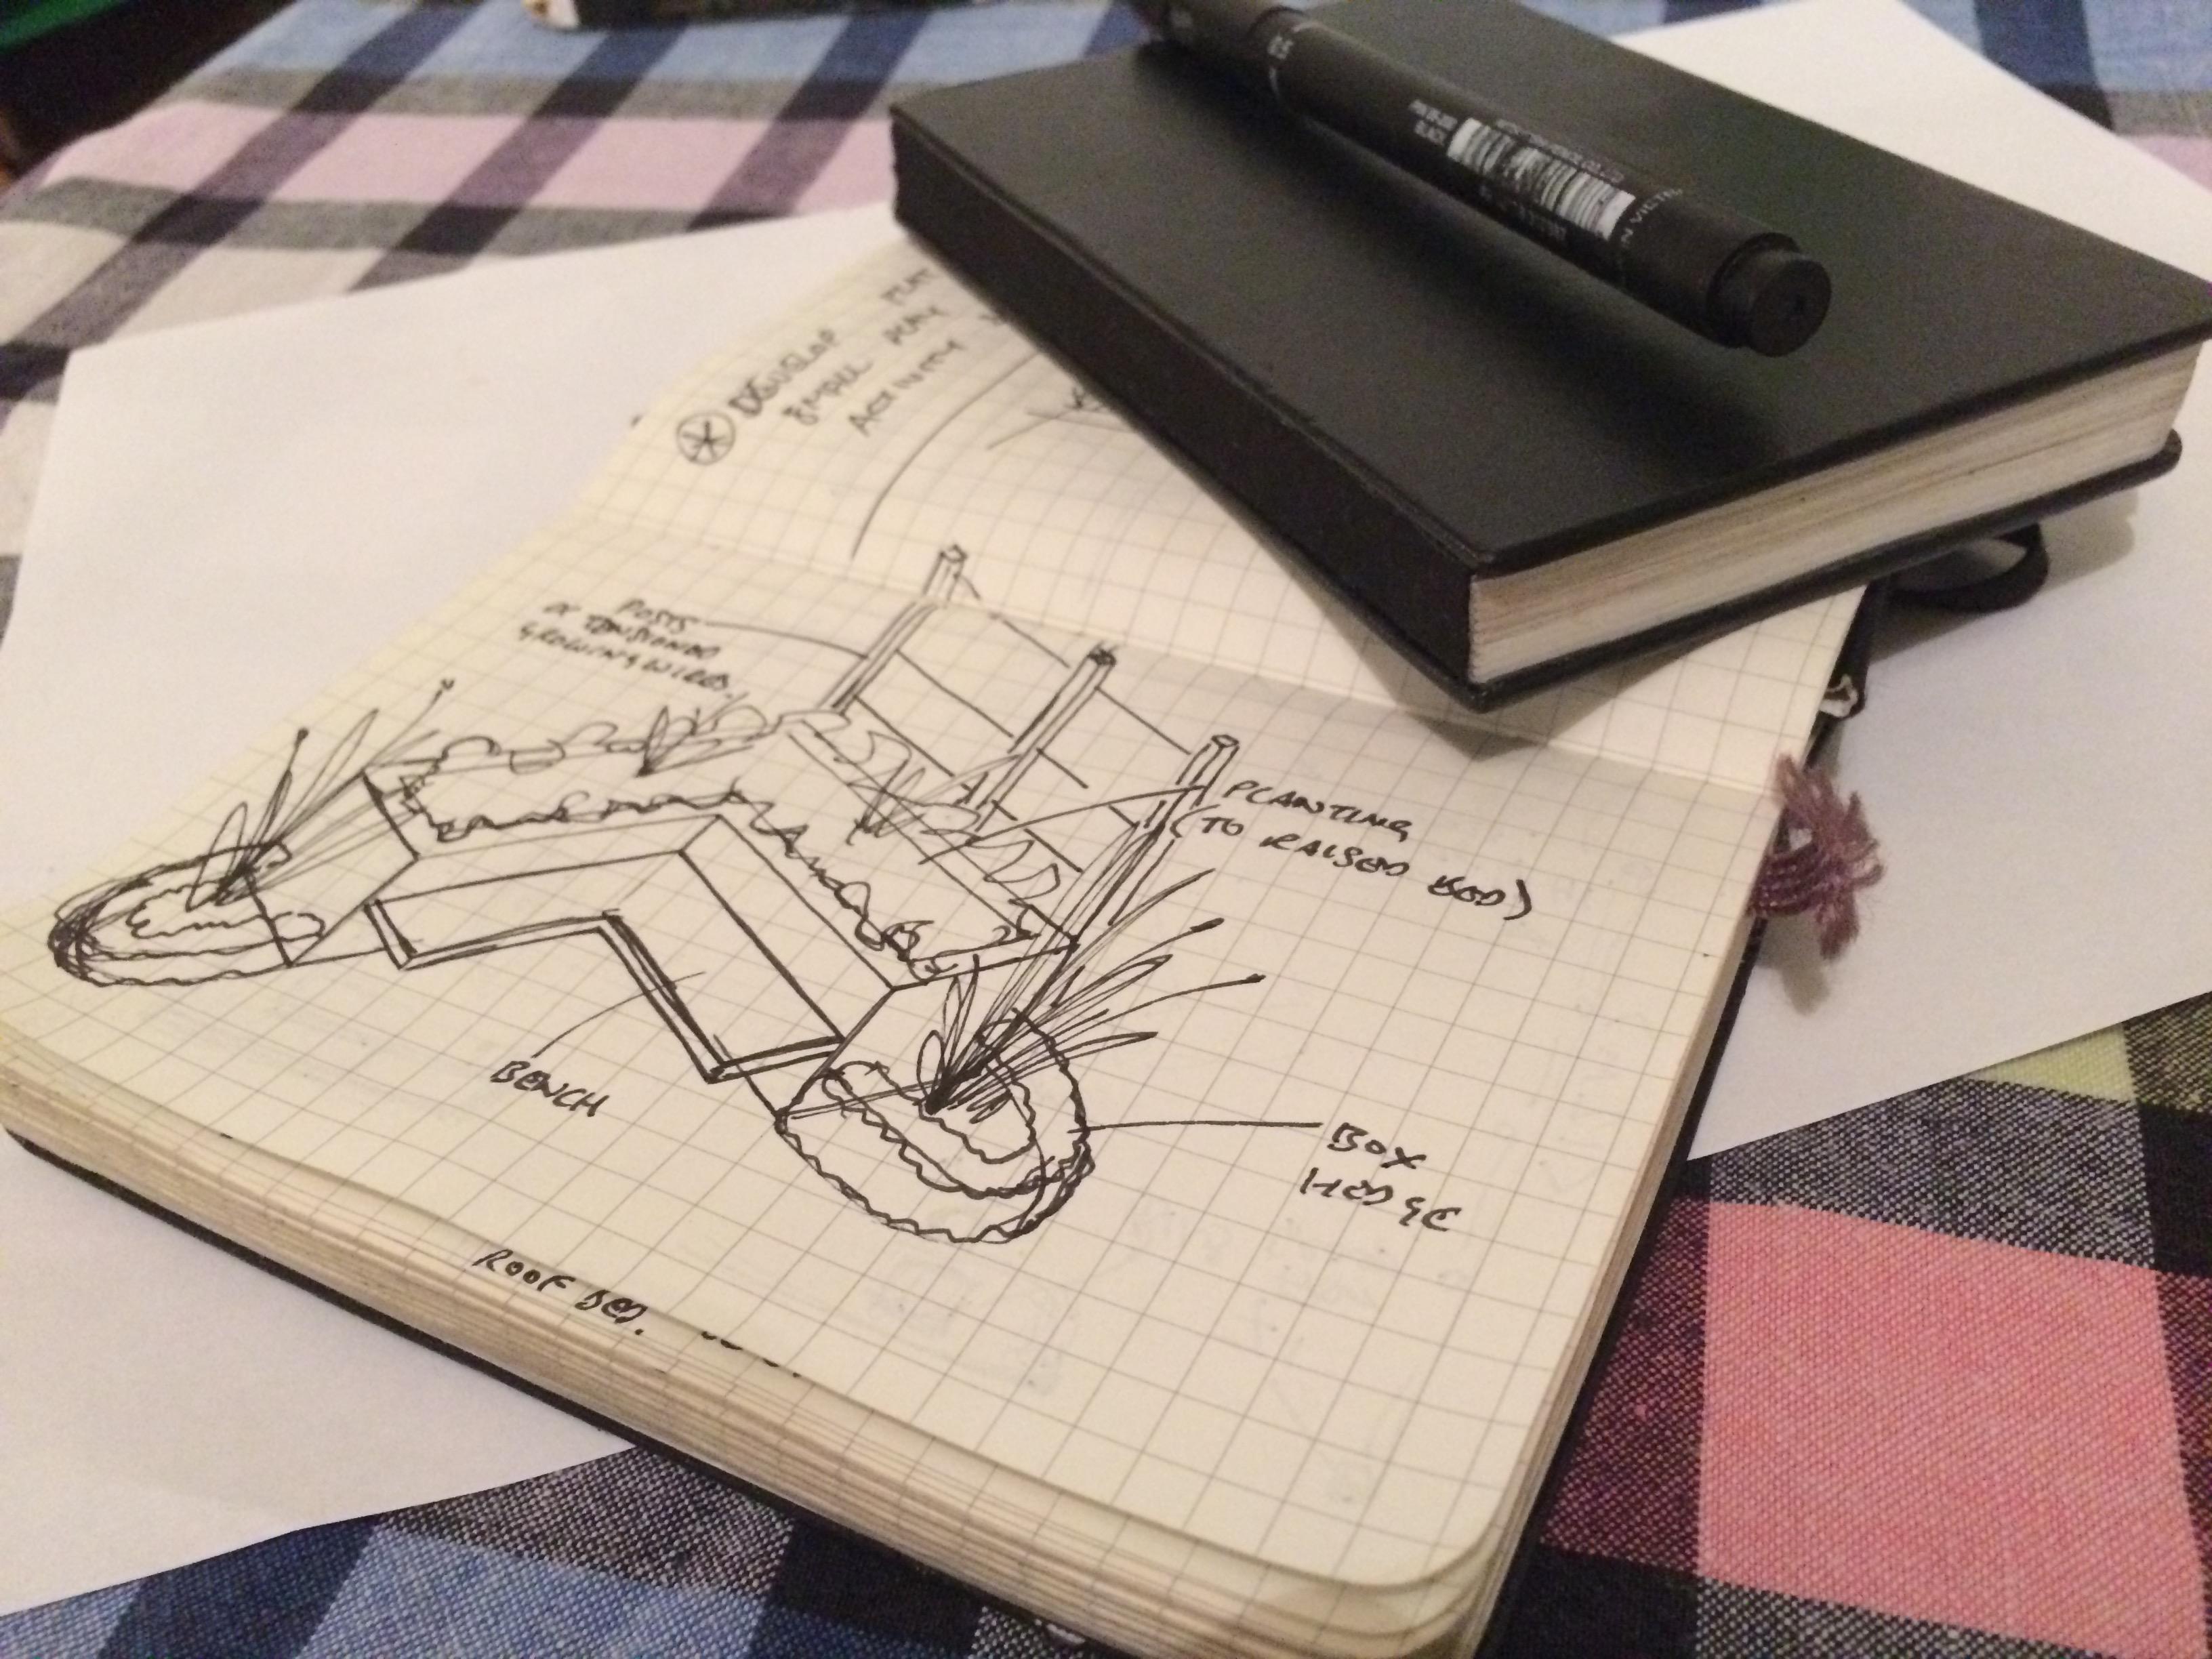 Thumbnail sketches